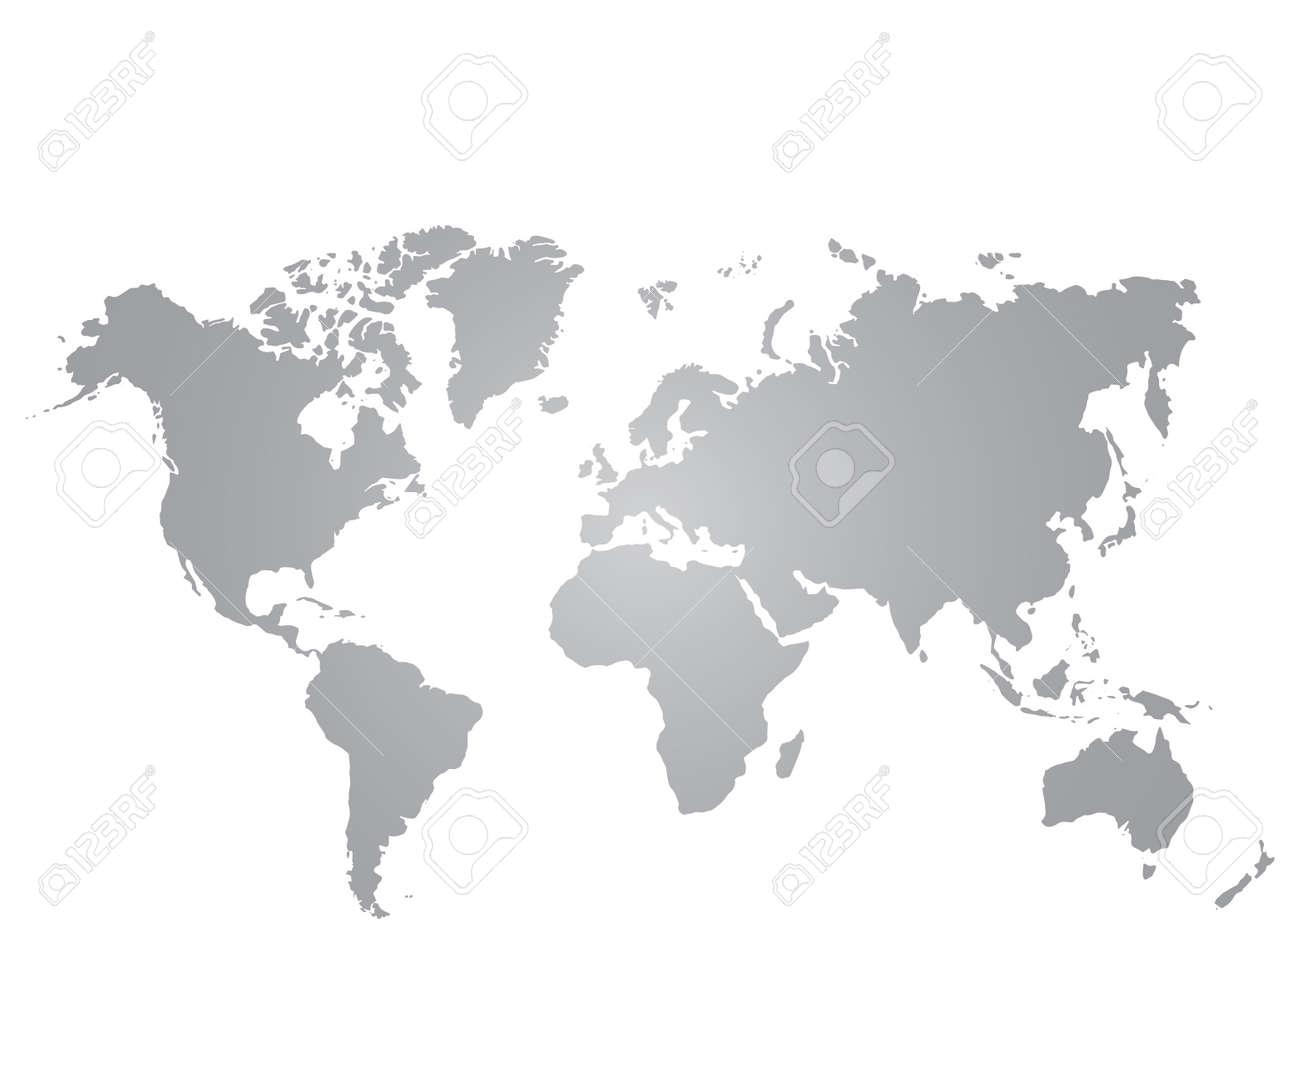 weltkarte grau Graue Weltkarte Auf Weißem Hintergrund Lizenzfrei Nutzbare  weltkarte grau